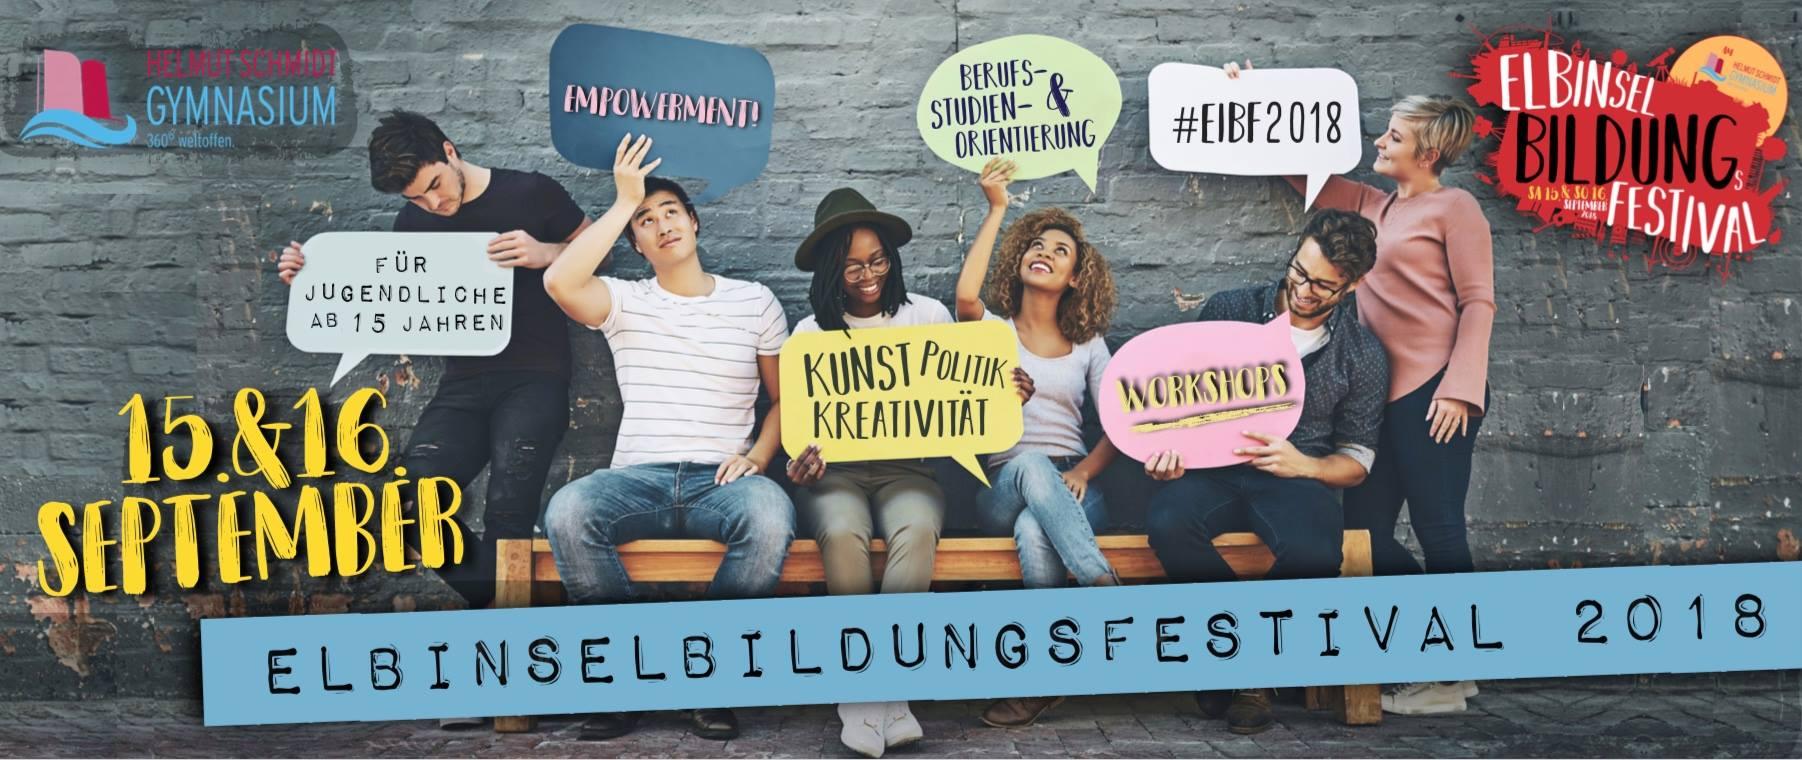 Elbinselbildungsfestival 2018